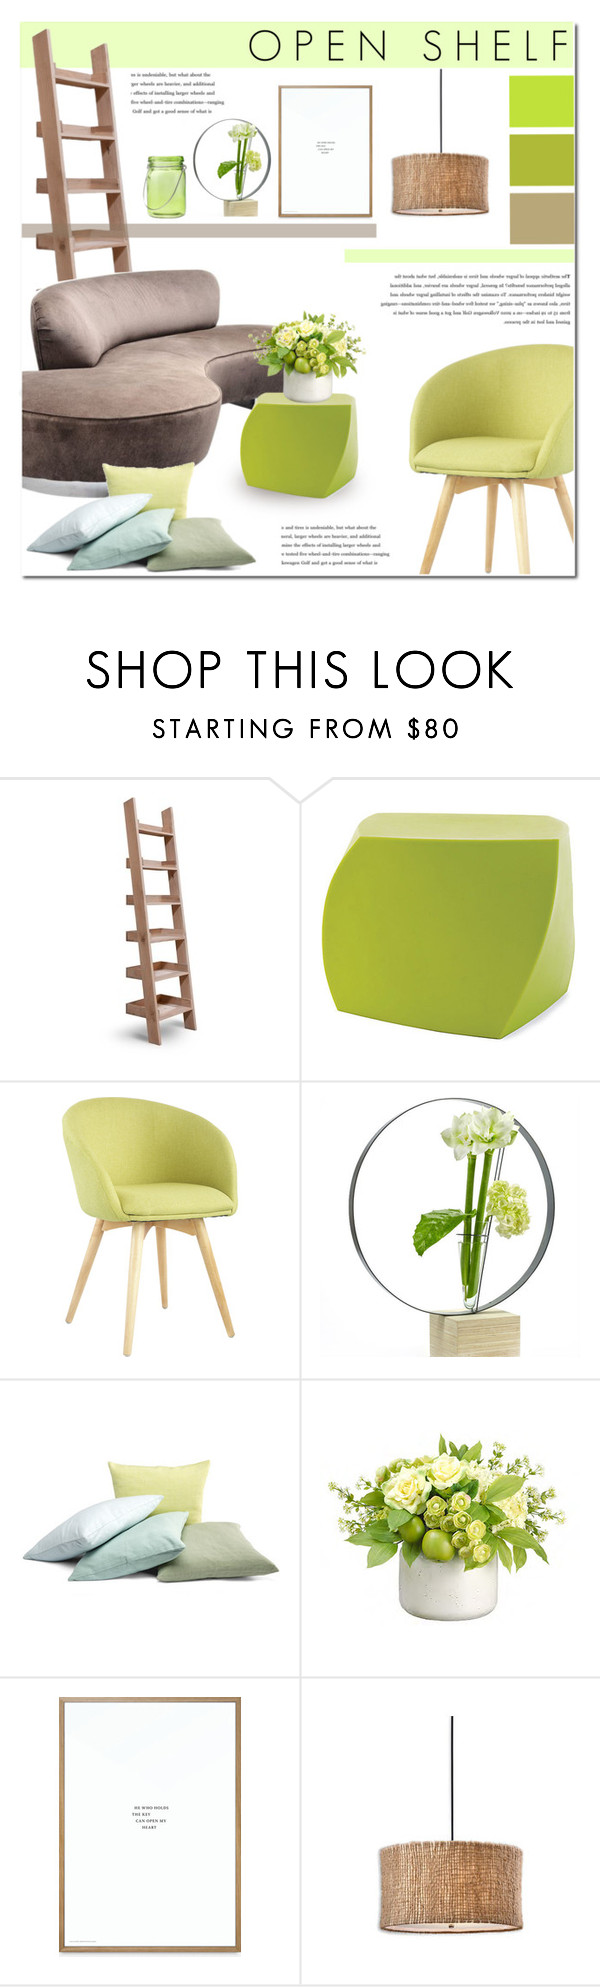 """Open Shelf"" by c-silla on Polyvore featuring interior, interiors, interior design, home, home decor, interior decorating, Garden Trading, Heller, Dot & Bo and Serax"